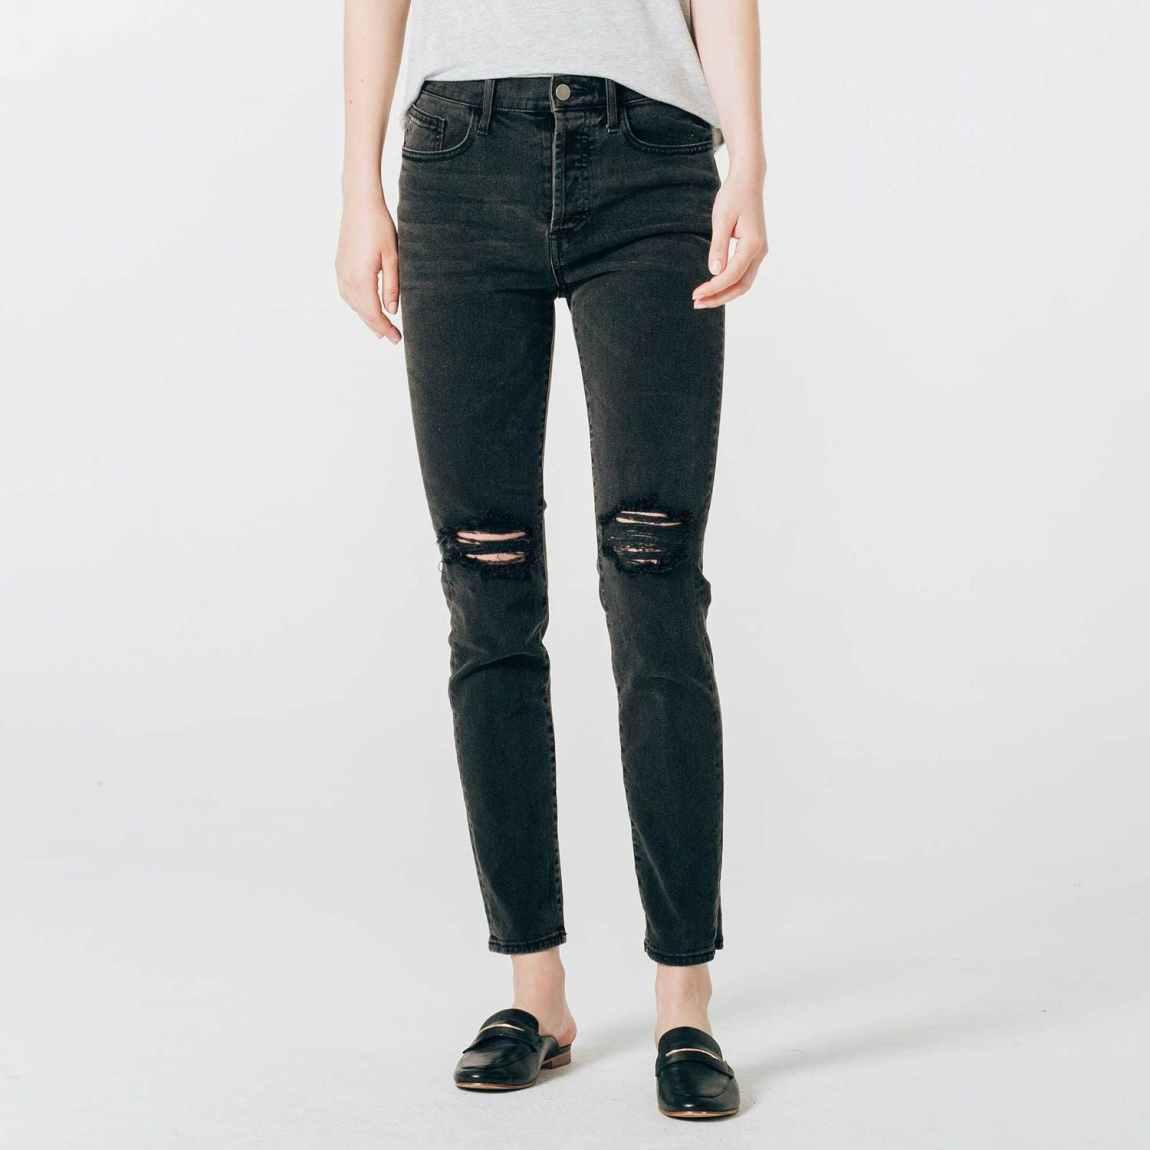 dstld, dstld jeans, mom jeans, high rise jeans, distressed jeans, destruced jeans, high rise jeans, ripped jeans, faded black denim, cropped denim